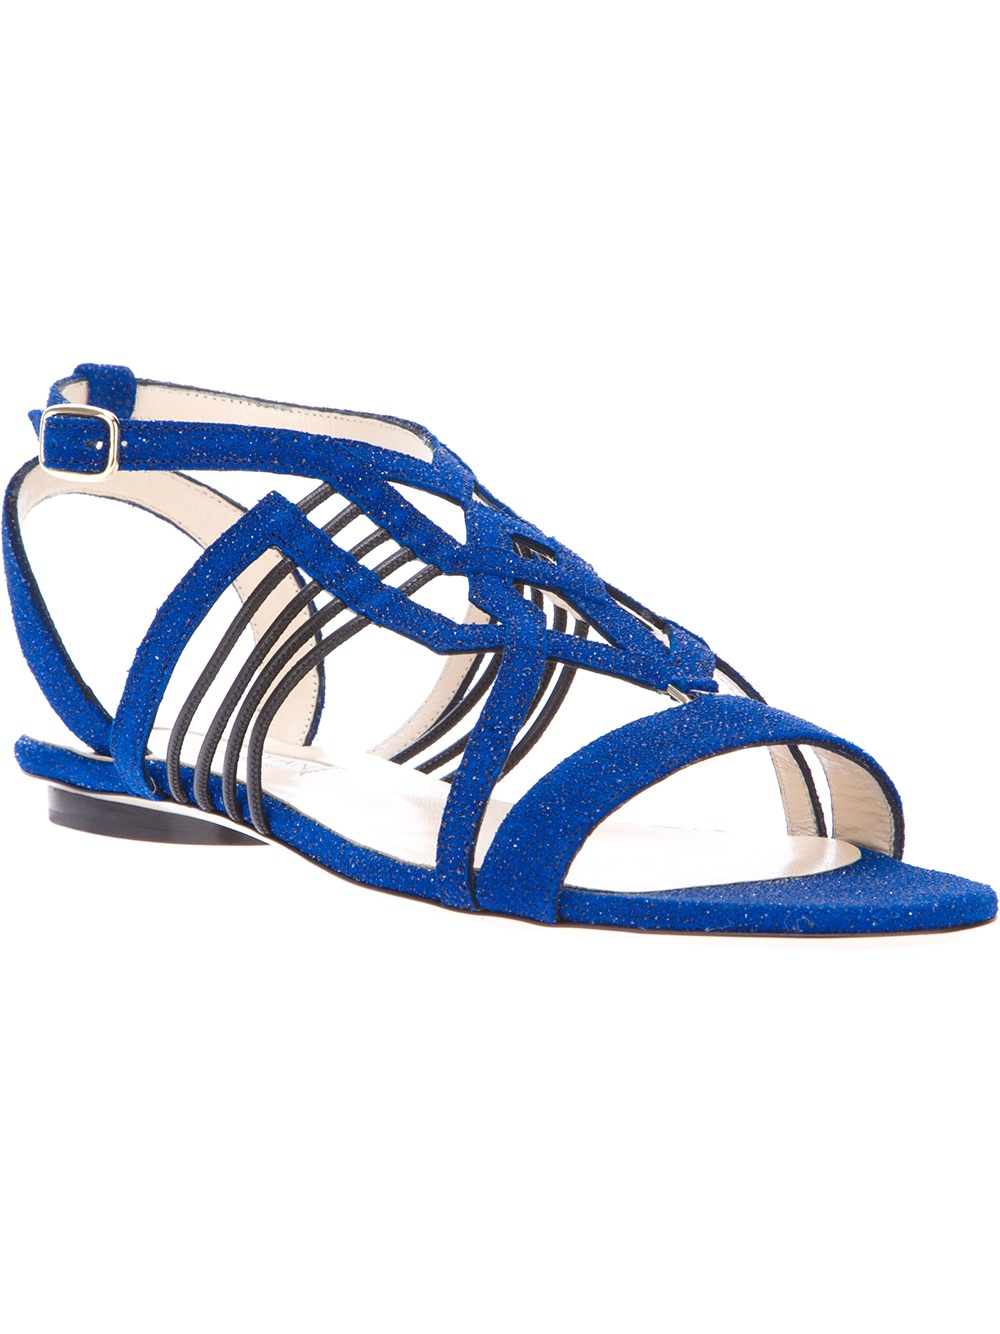 f25fa49f93e4 Lyst - Burak Uyan Flat Sandal in Blue